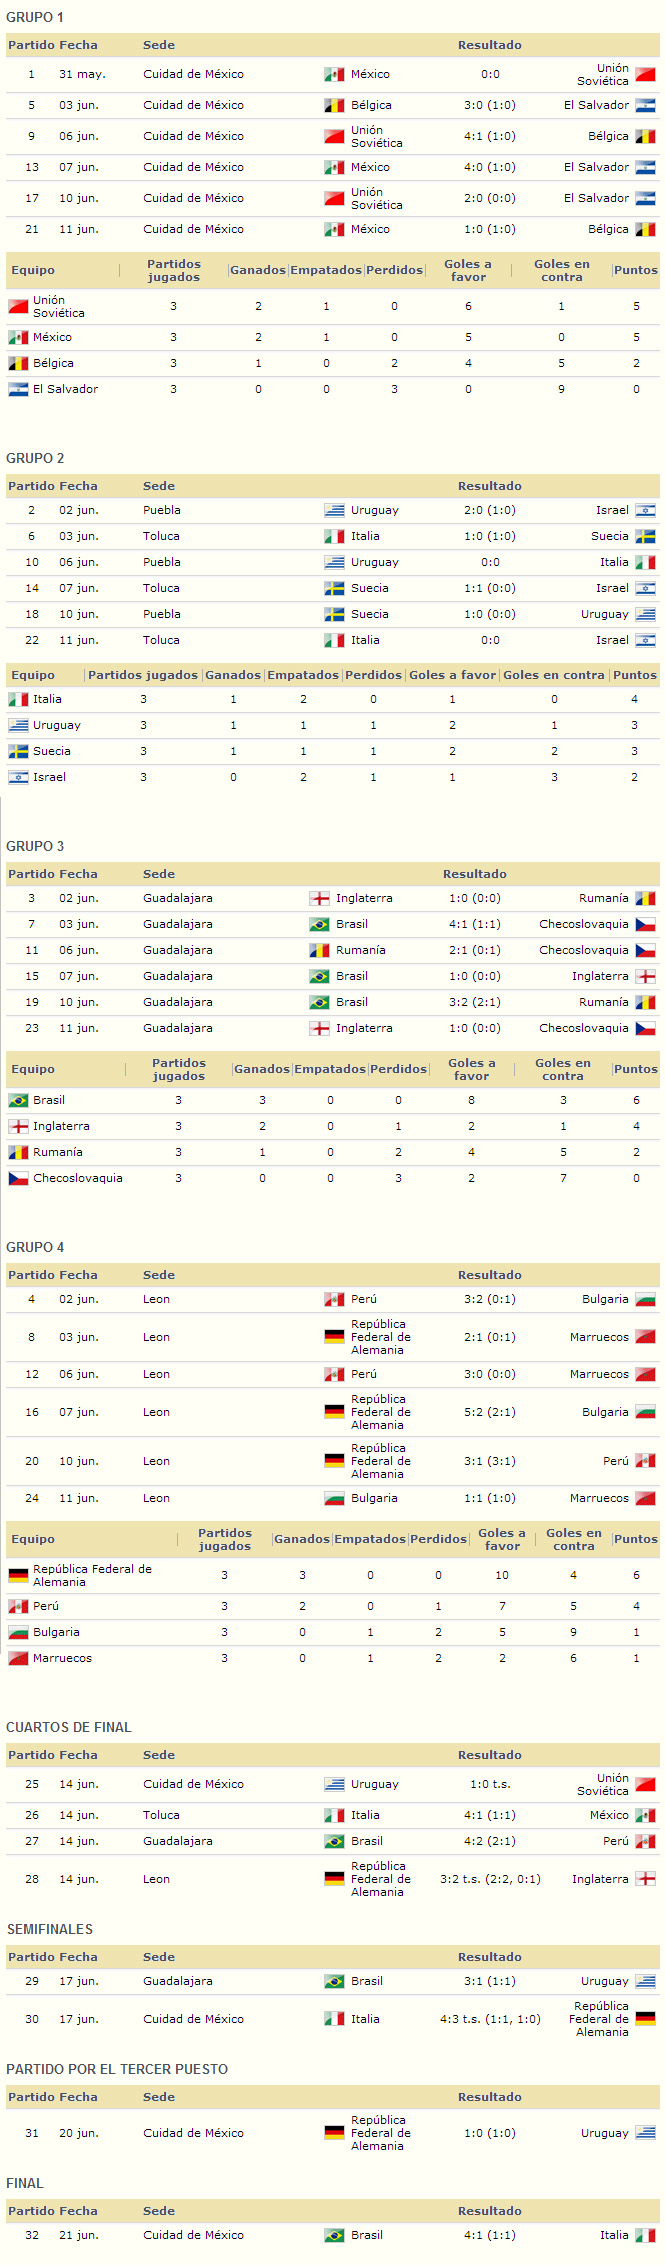 Mundial Mexico 1970 resultados